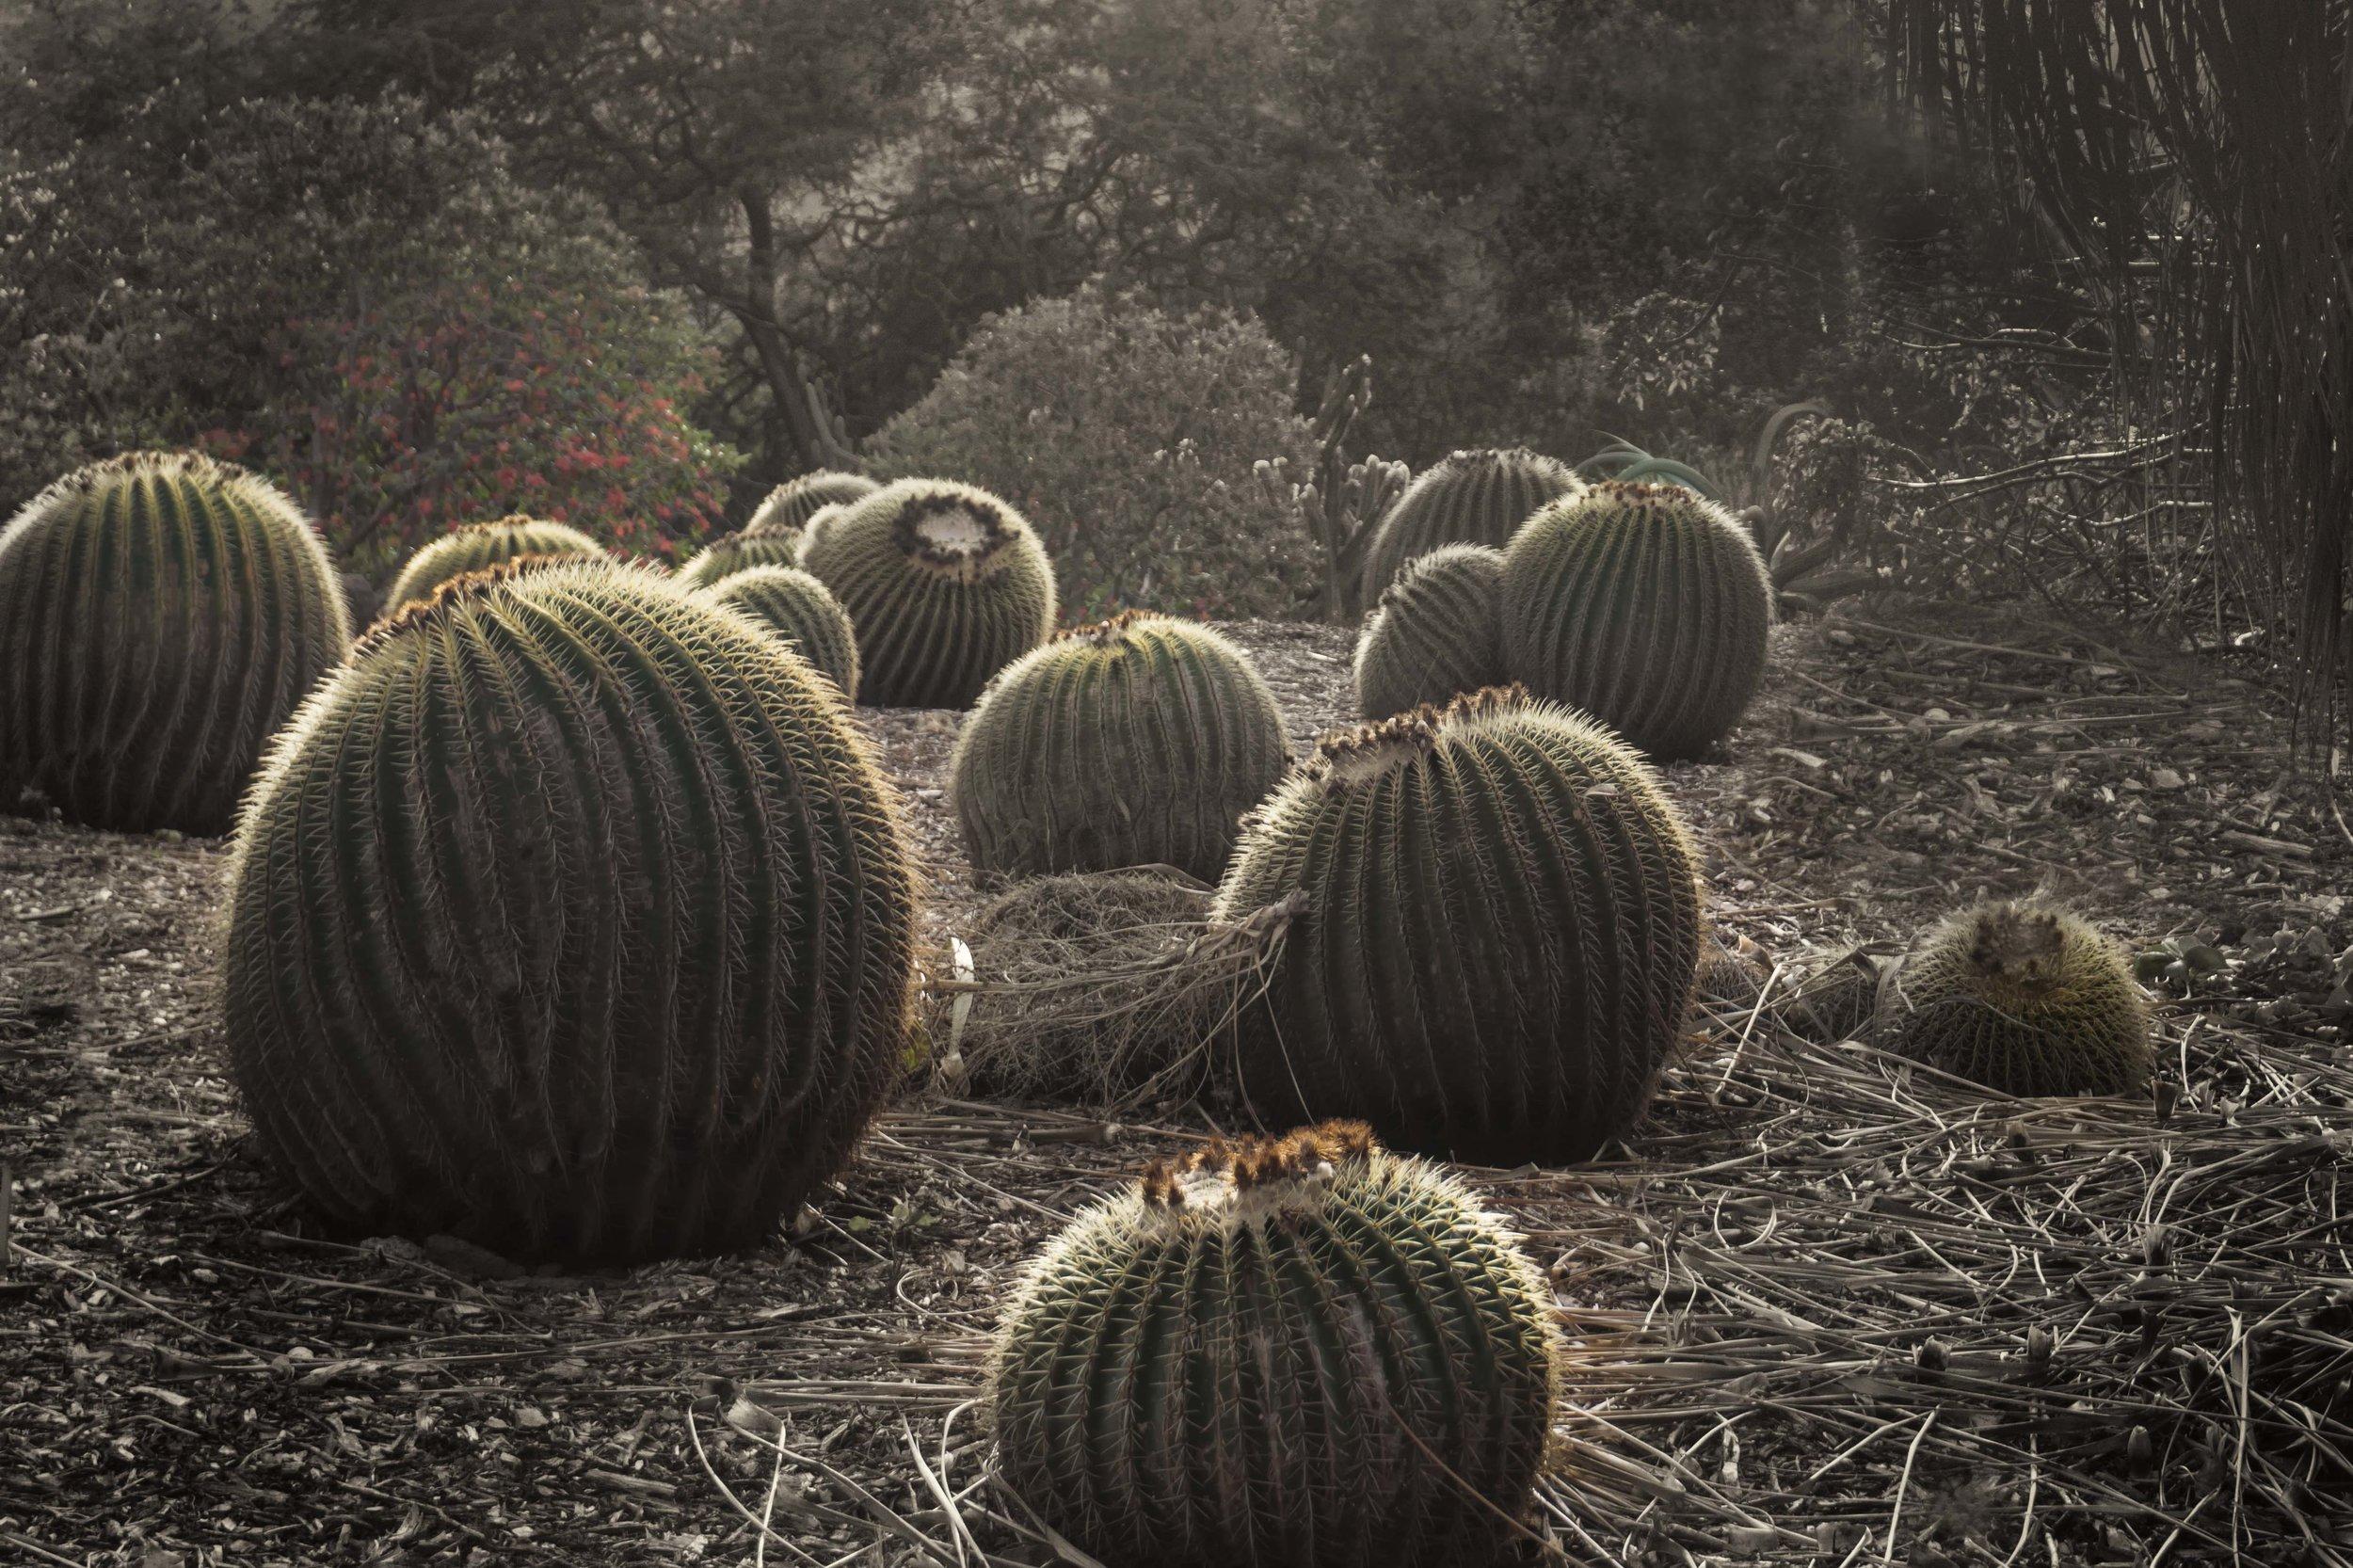 Biznaga de Zimapan  or Golden Barrel Cactus, Oahu, Hawaii